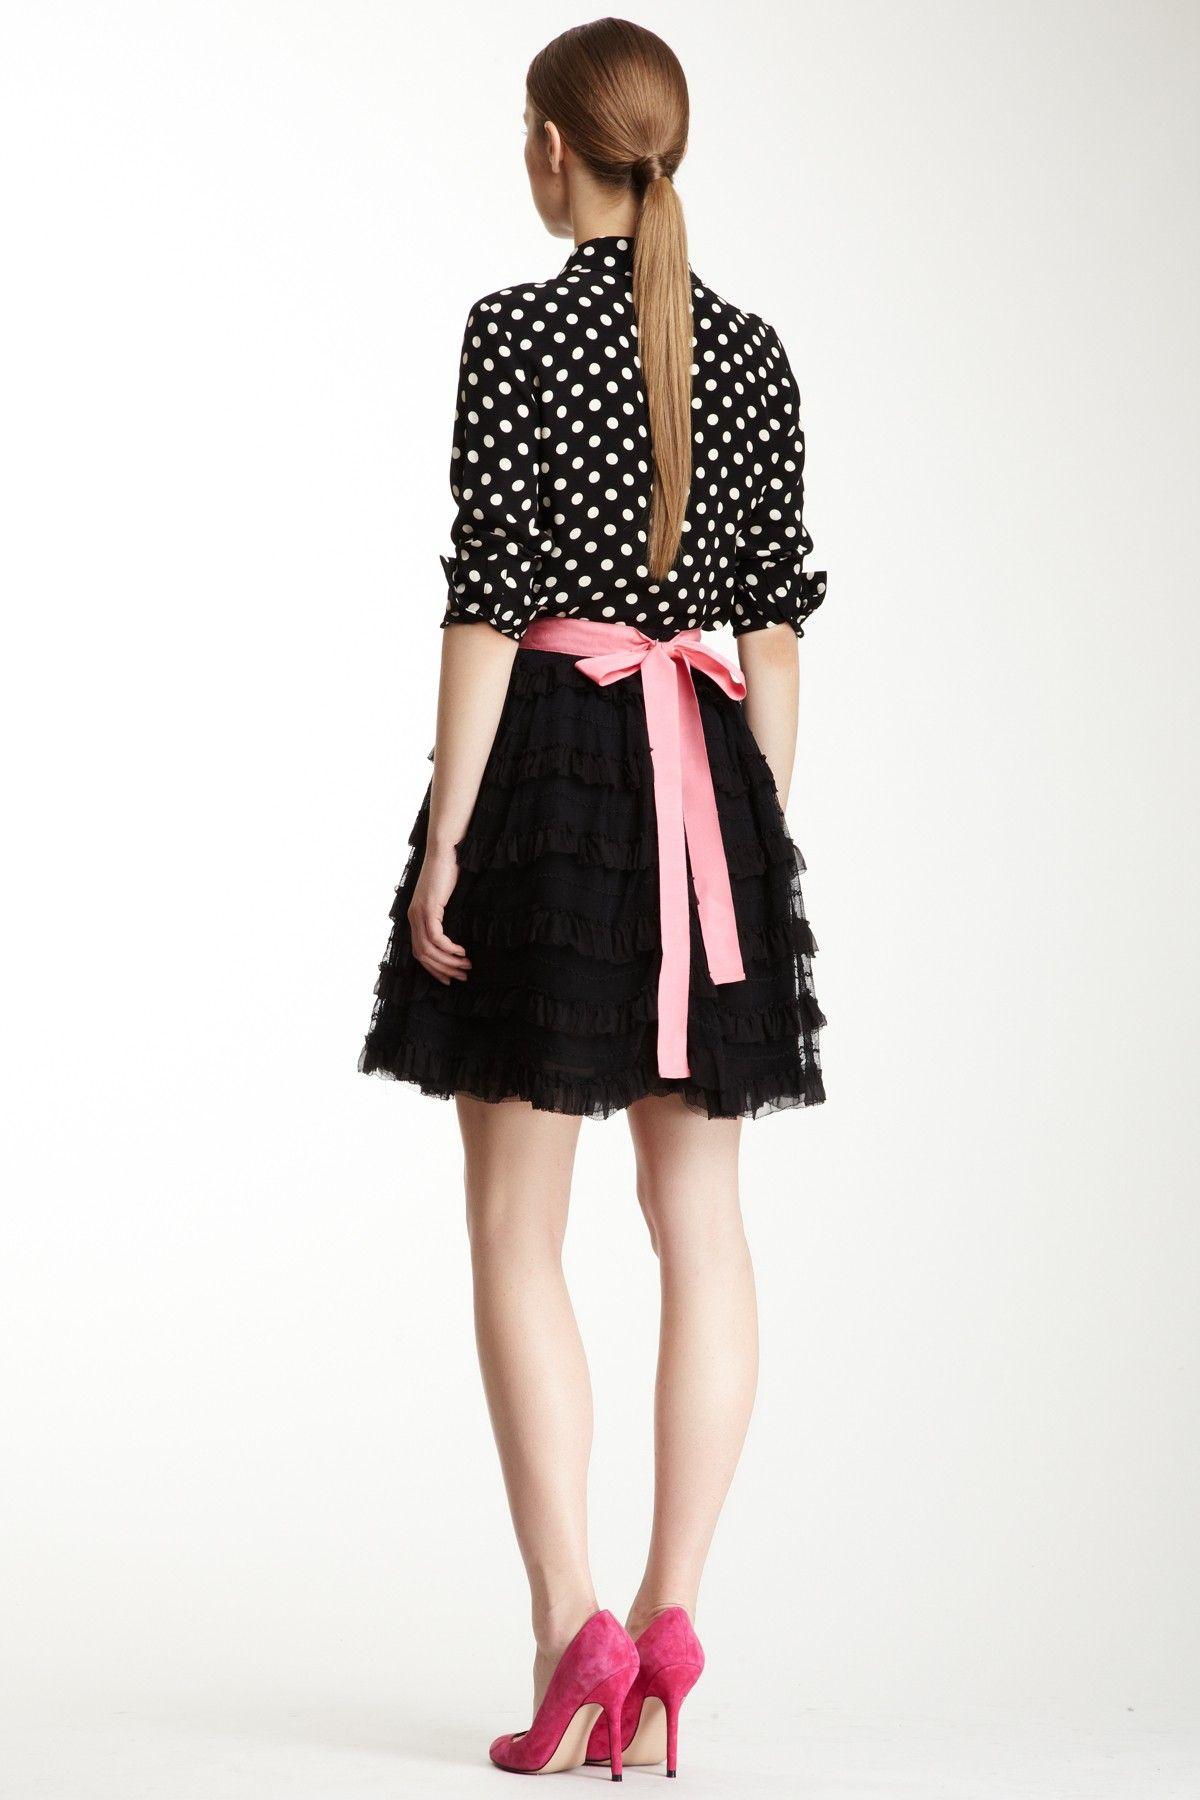 RED Valentino Silk Blend TieRED Ruffle Skirt